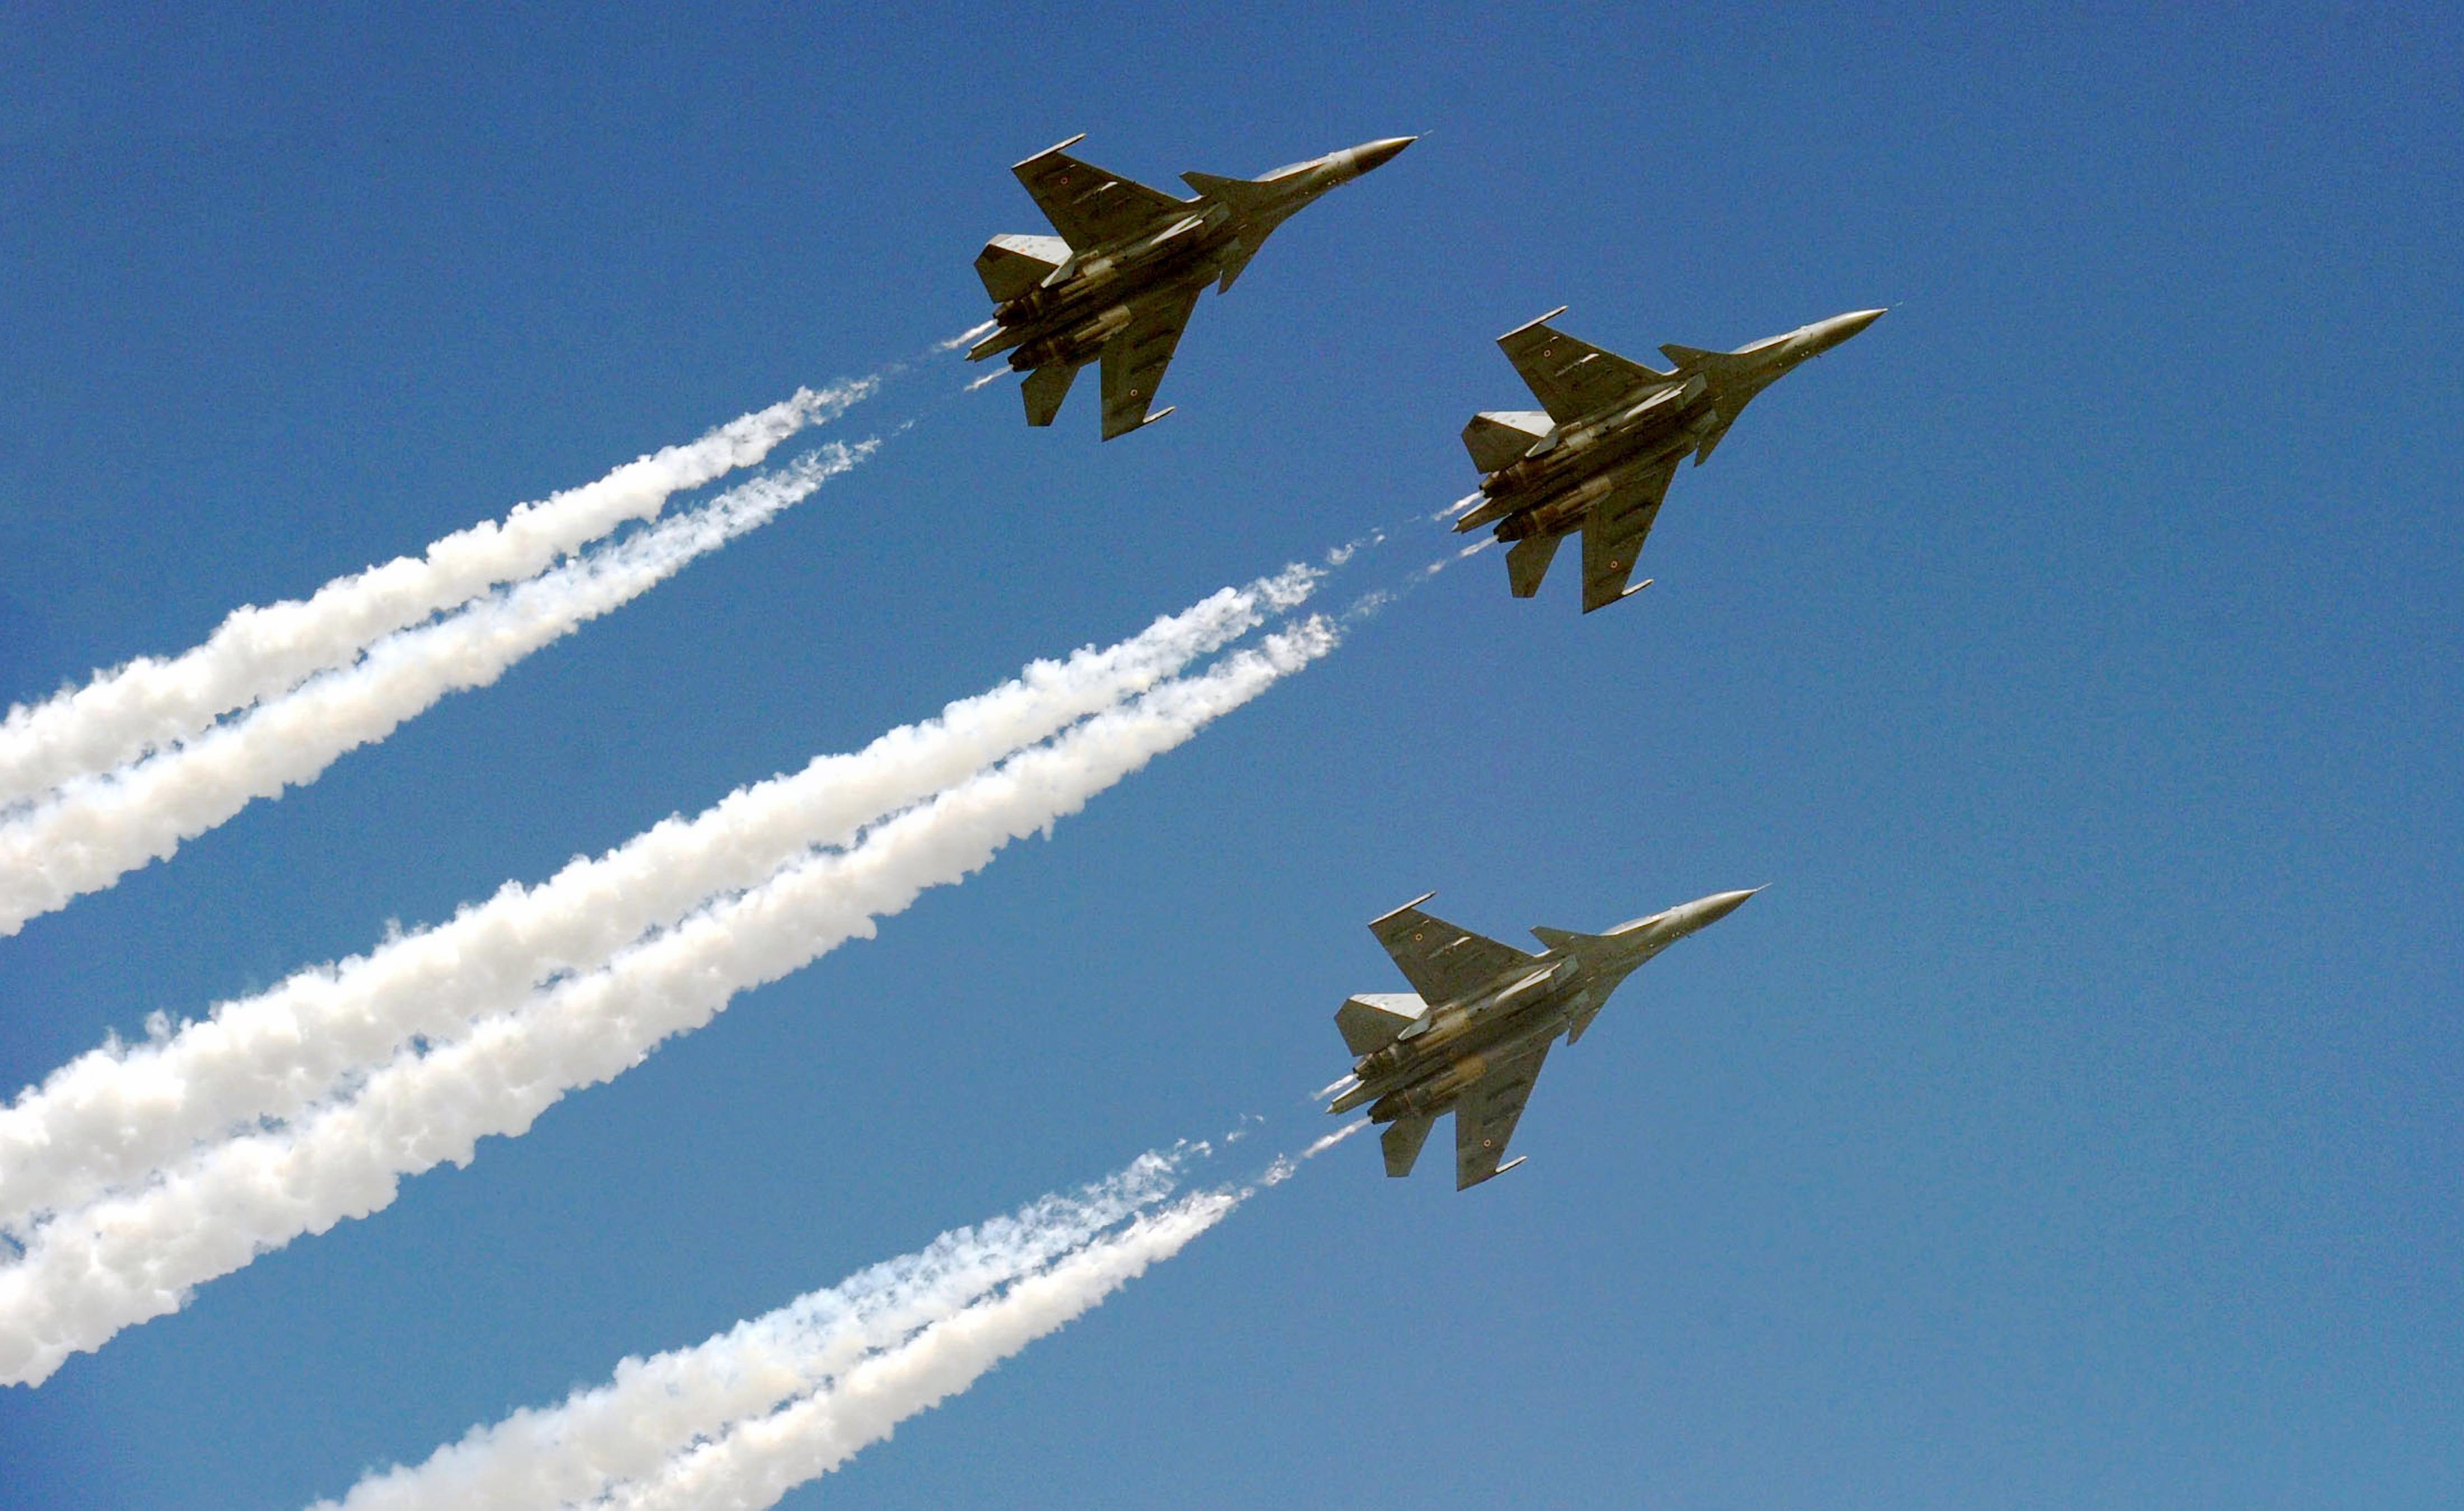 IAF operates 230 Su-30MKI aircraft. Source: Zuma/Global Look Press